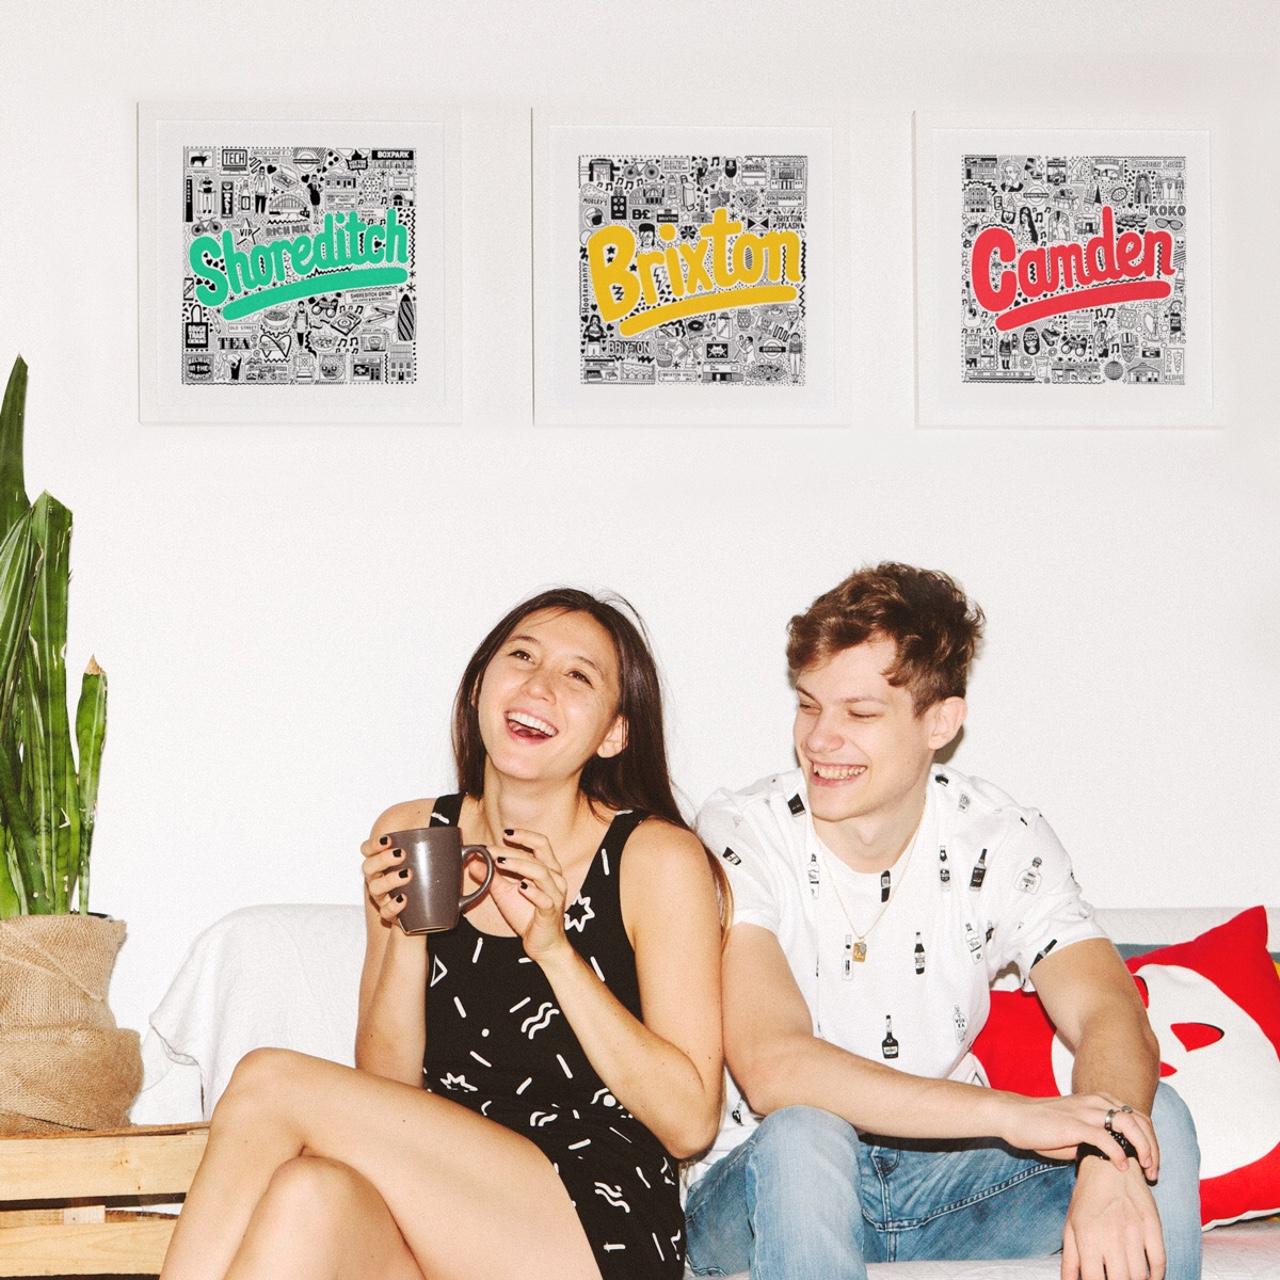 Place in Print Jenni Sparks Brighton Hometowns Art Print Lifestyle